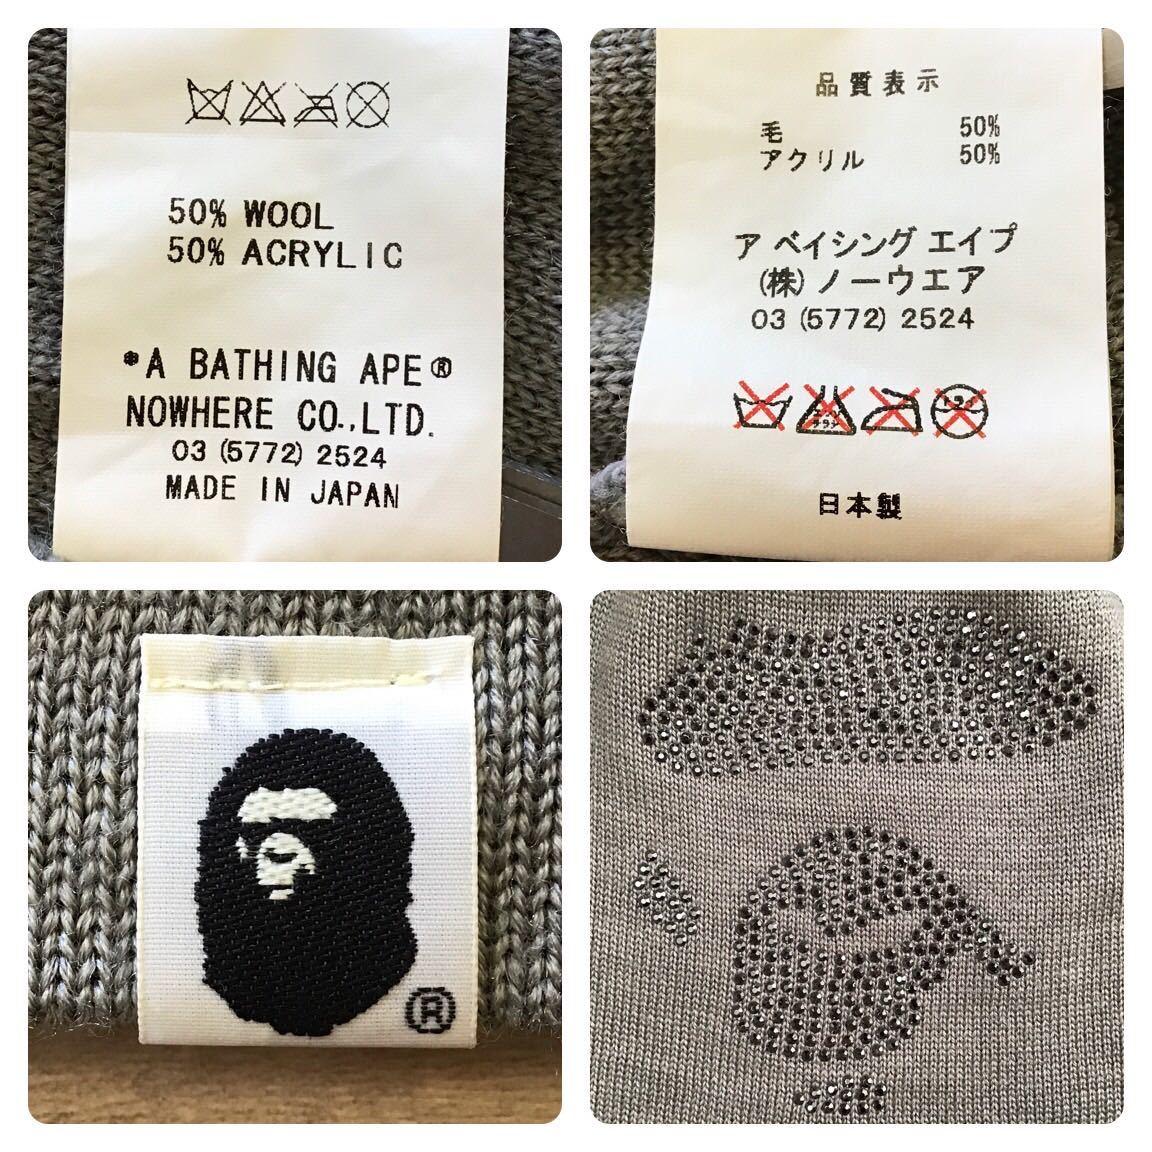 swarovski ape face ニット帽 グレー ビーニー a bathing ape BAPE Beanie エイプ ベイプ アベイシングエイプ スワロフスキー 帽子 63ja